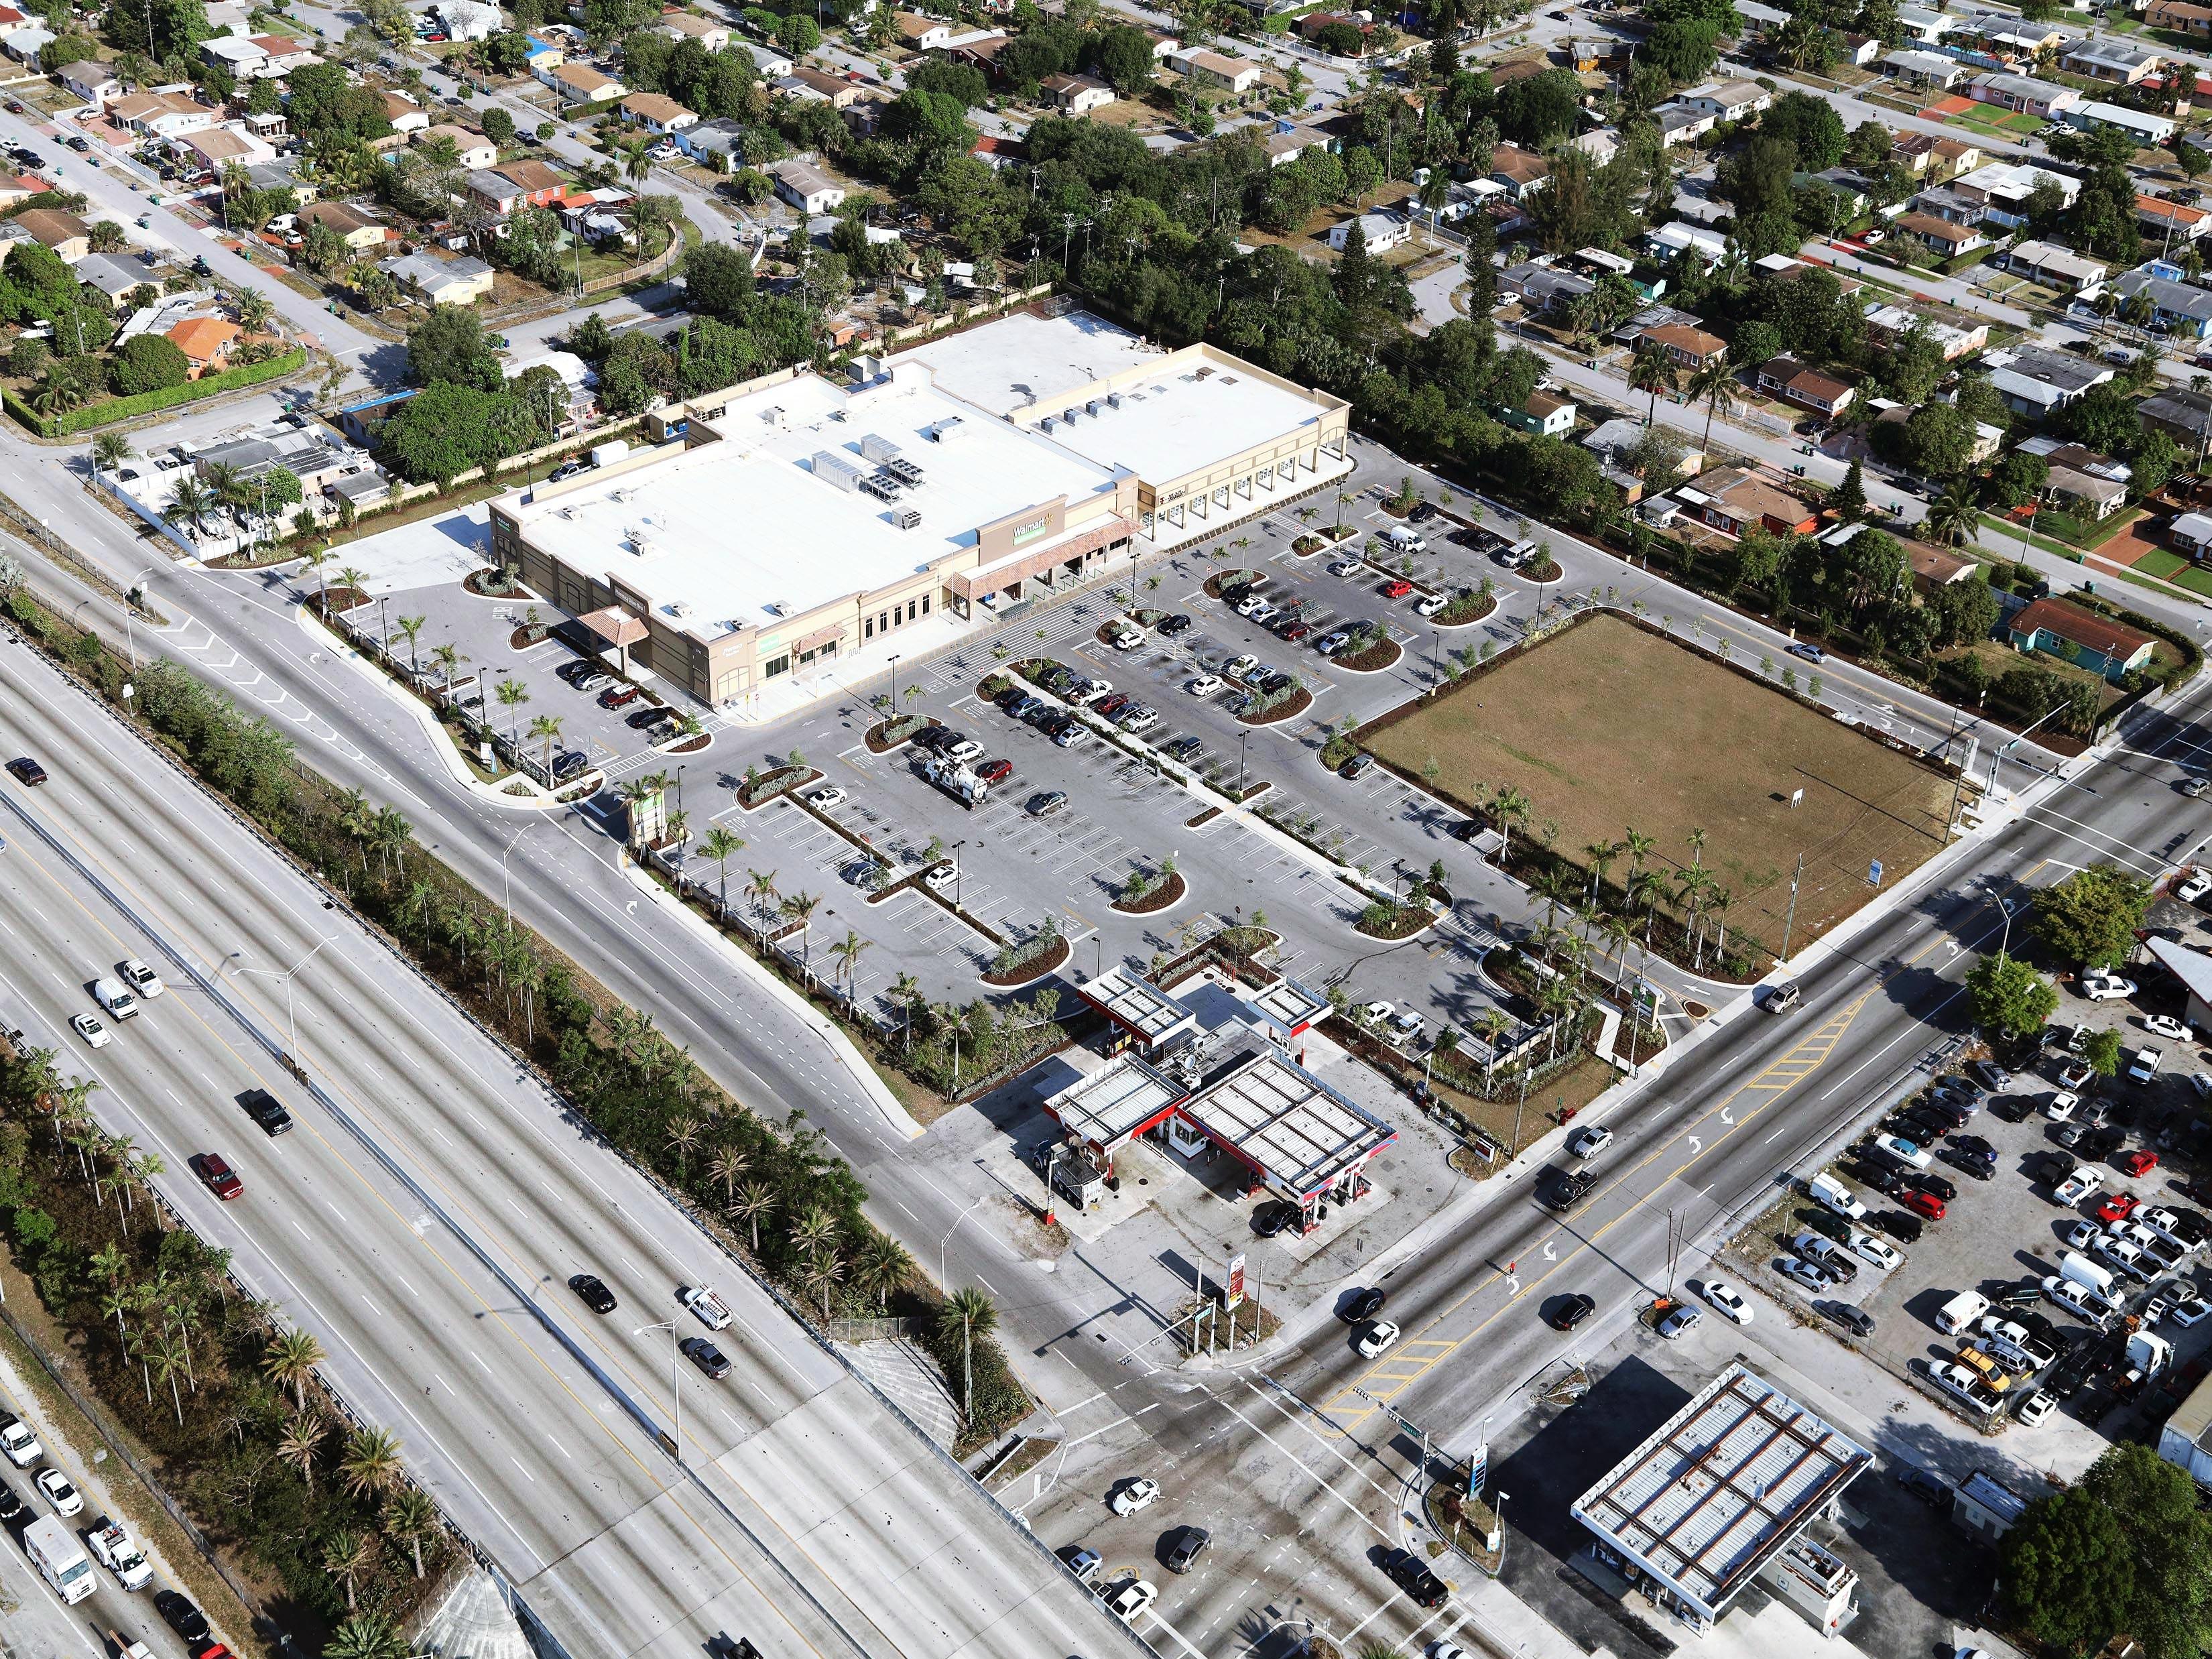 Aerial view of Palmetto Design Center